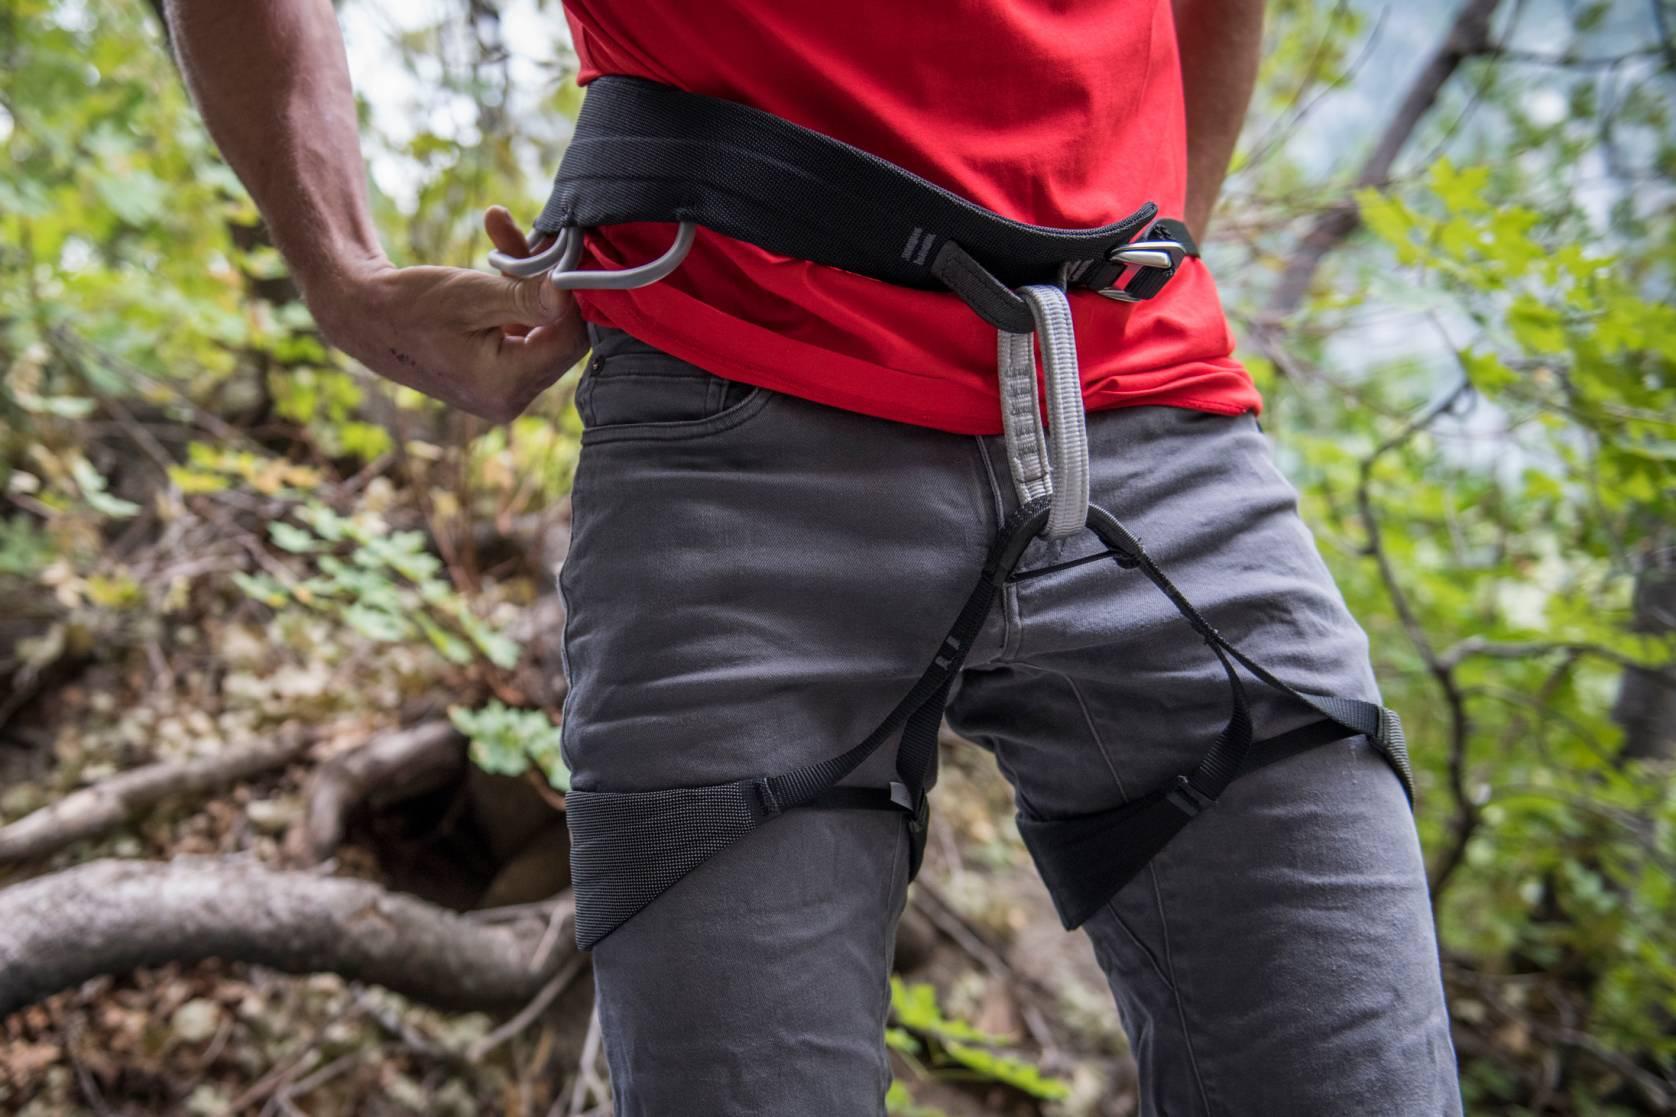 Black Diamond Solution Guide trad climbing harness